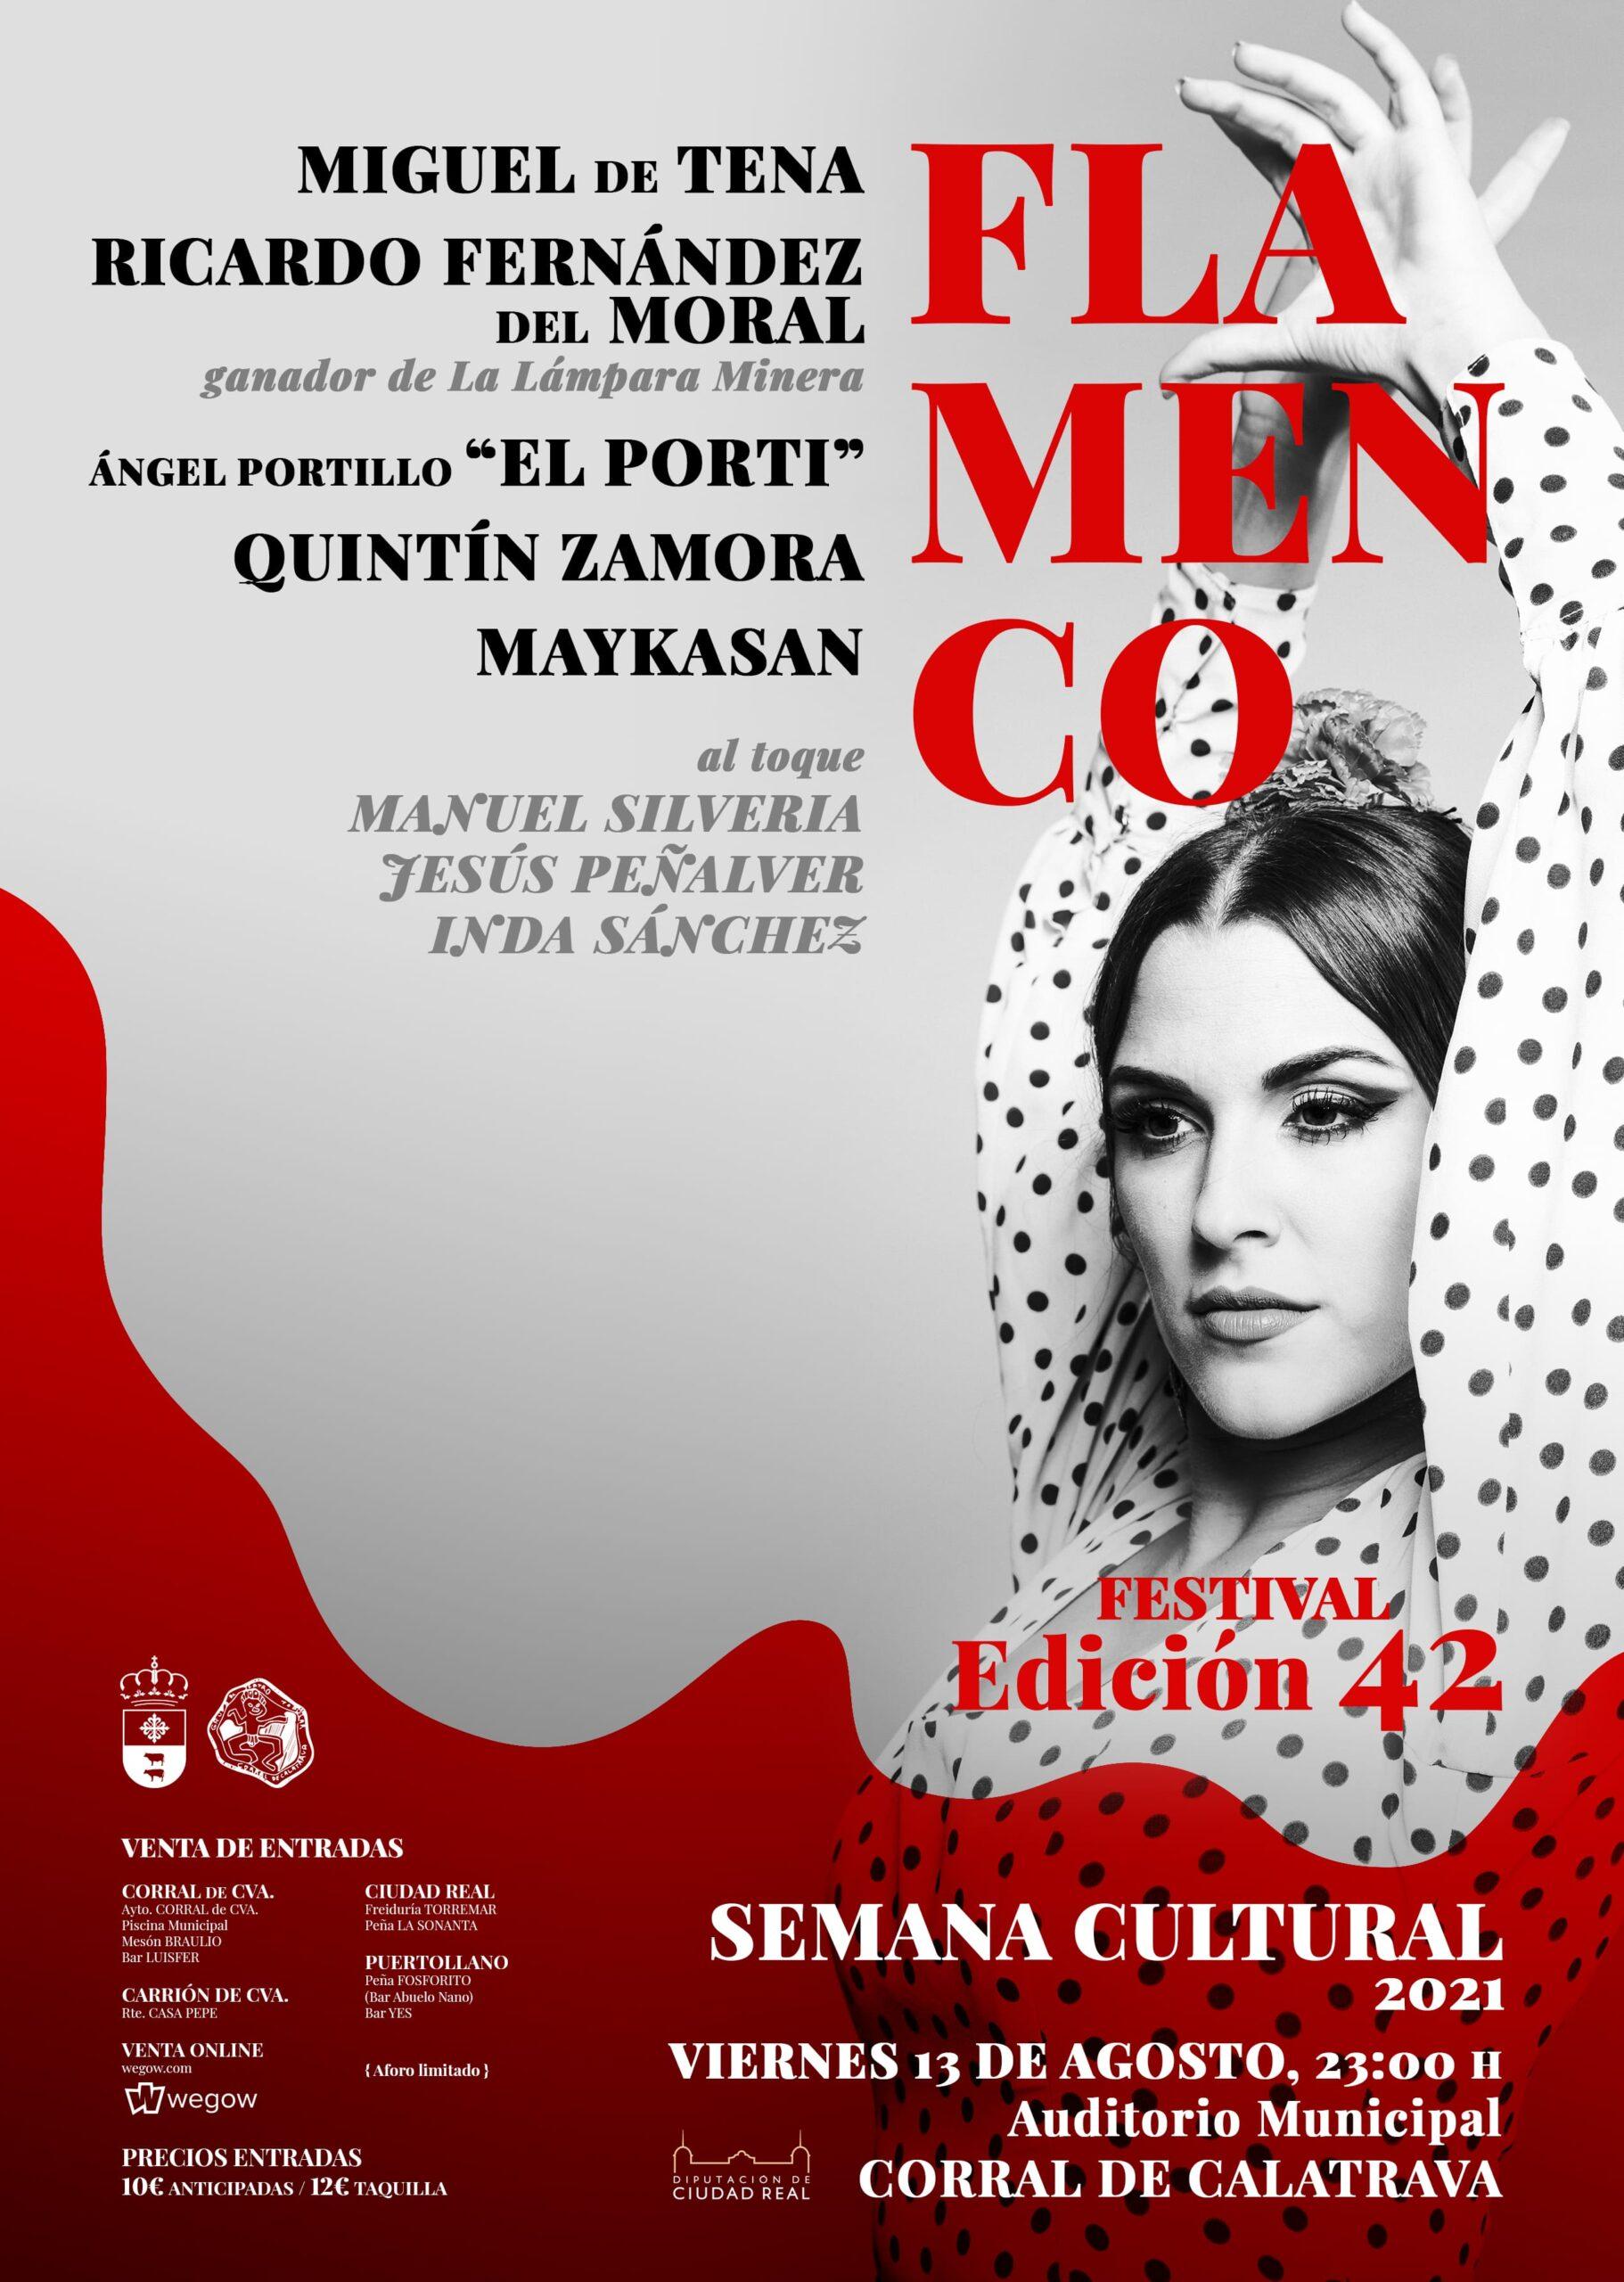 festival flamenco 42 corral de calatrava 1625555838750532